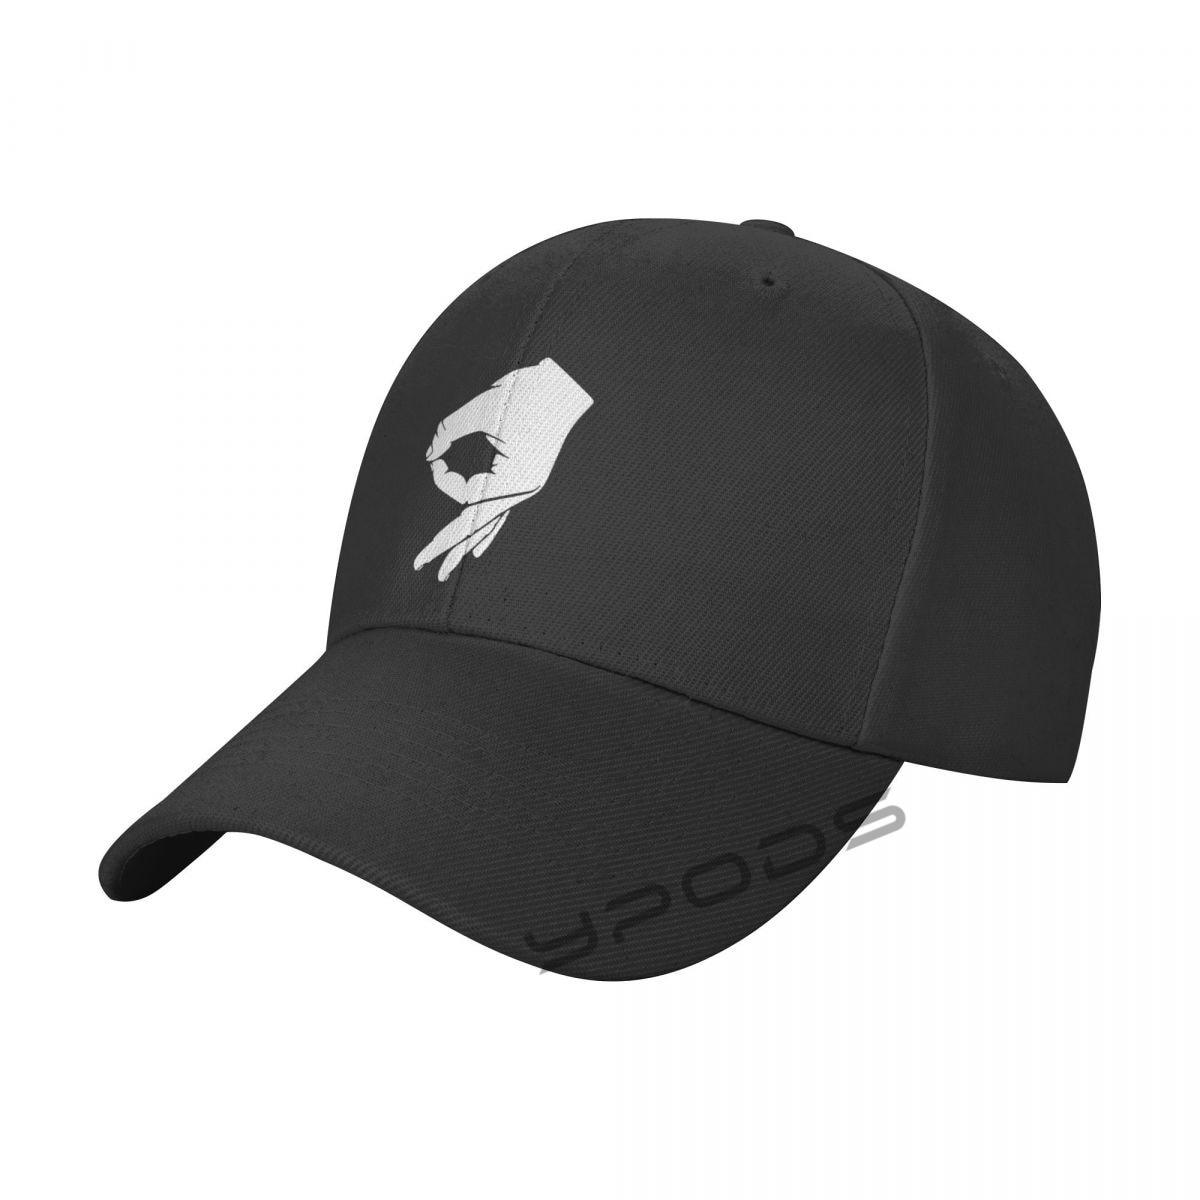 Новинка, бейсболка OK Hand, кепка для мужчин и женщин, мужская Кепка, Снэпбэк Кепка, повседневная Кепка, кепки, шапки